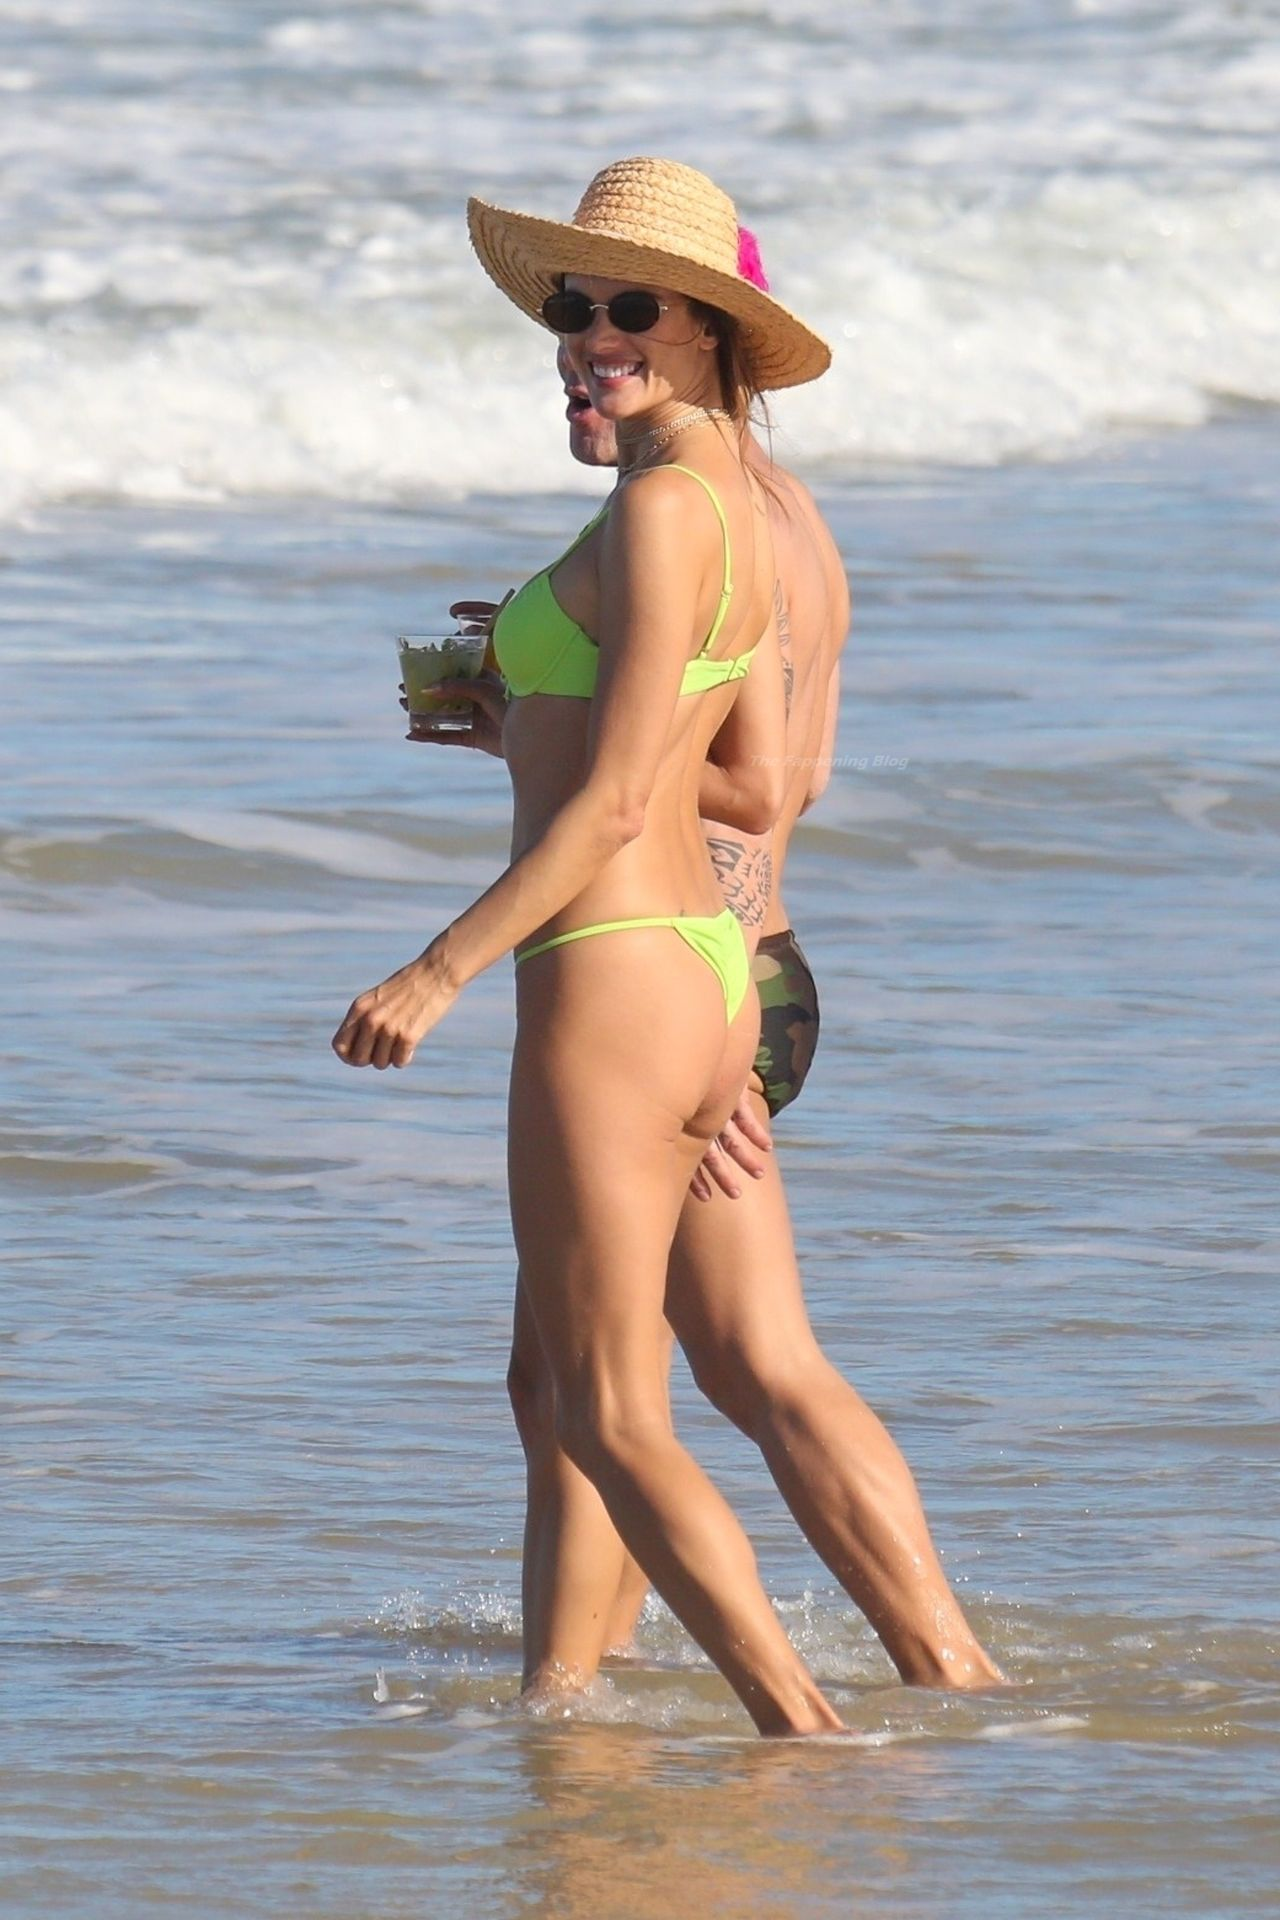 Alessandra-Ambrosio-Sexy-The-Fappening-Blog-321.jpg